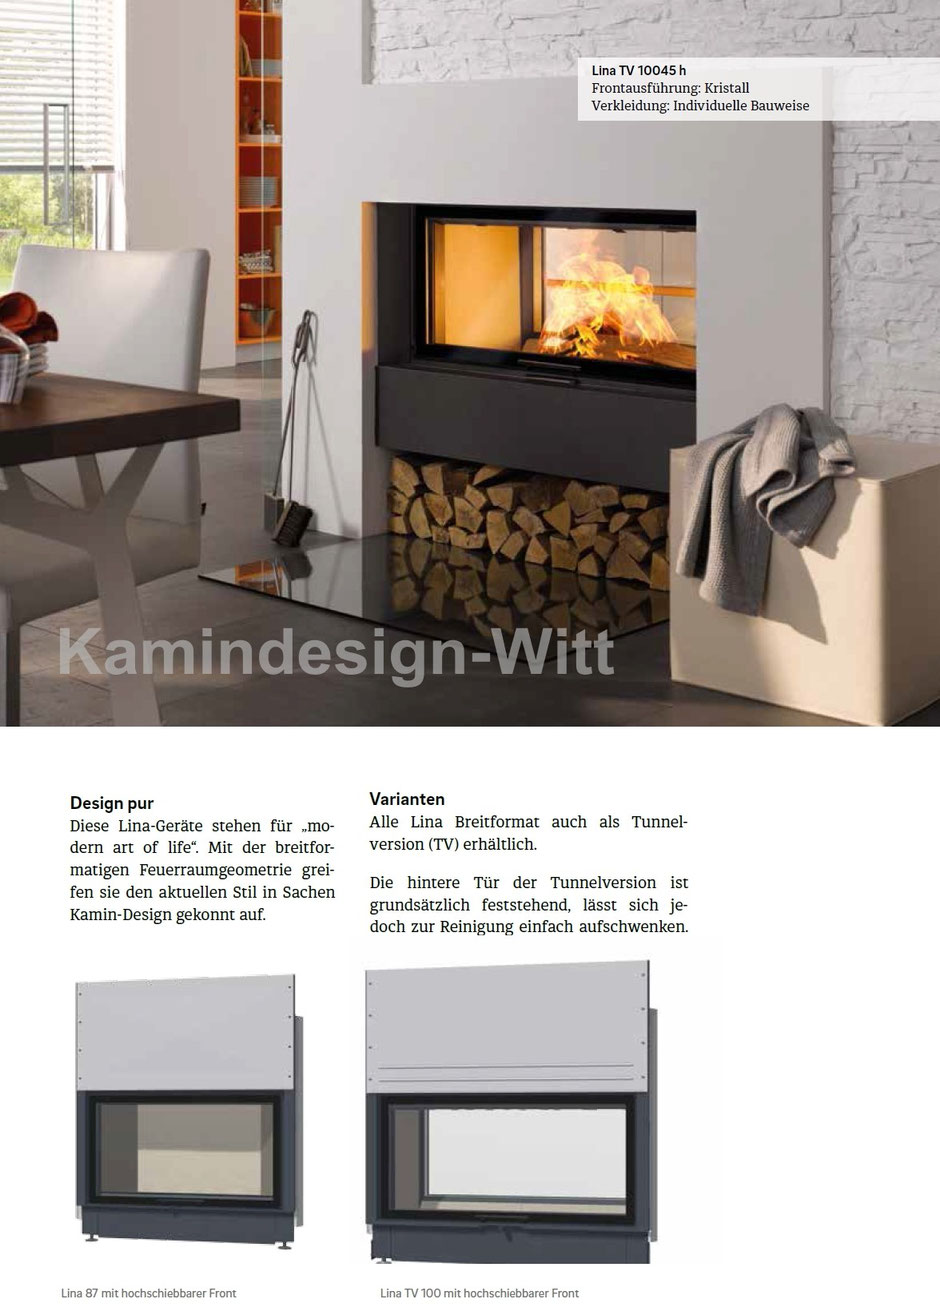 Schmid-Lina-67s-Kamineinsatz